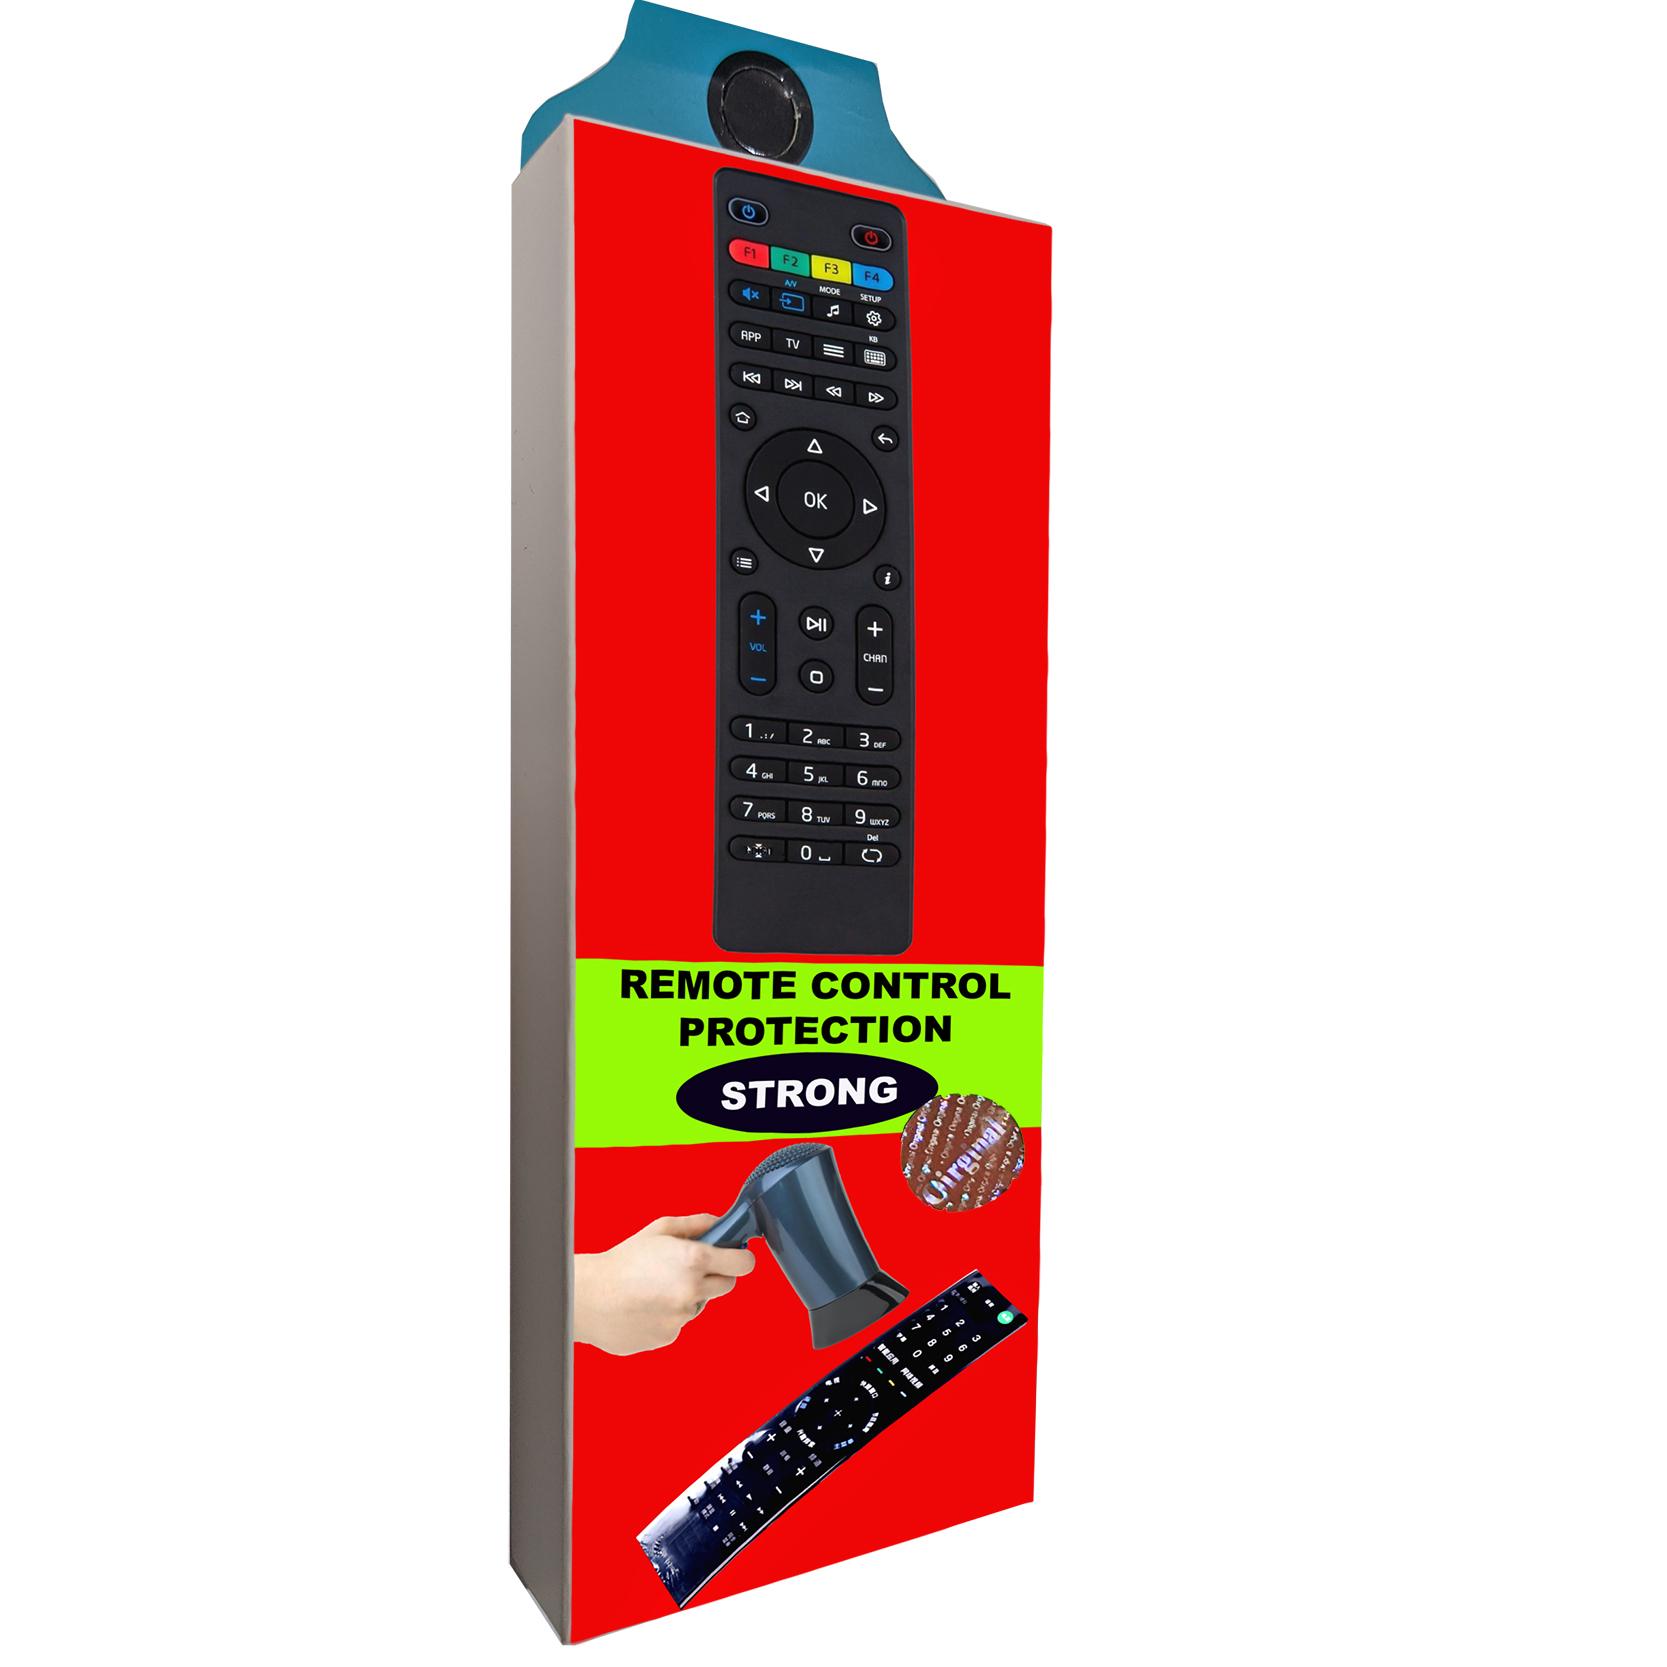 محافظ ریموت کنترل مدل STRONG 01 بسته 30 عددی